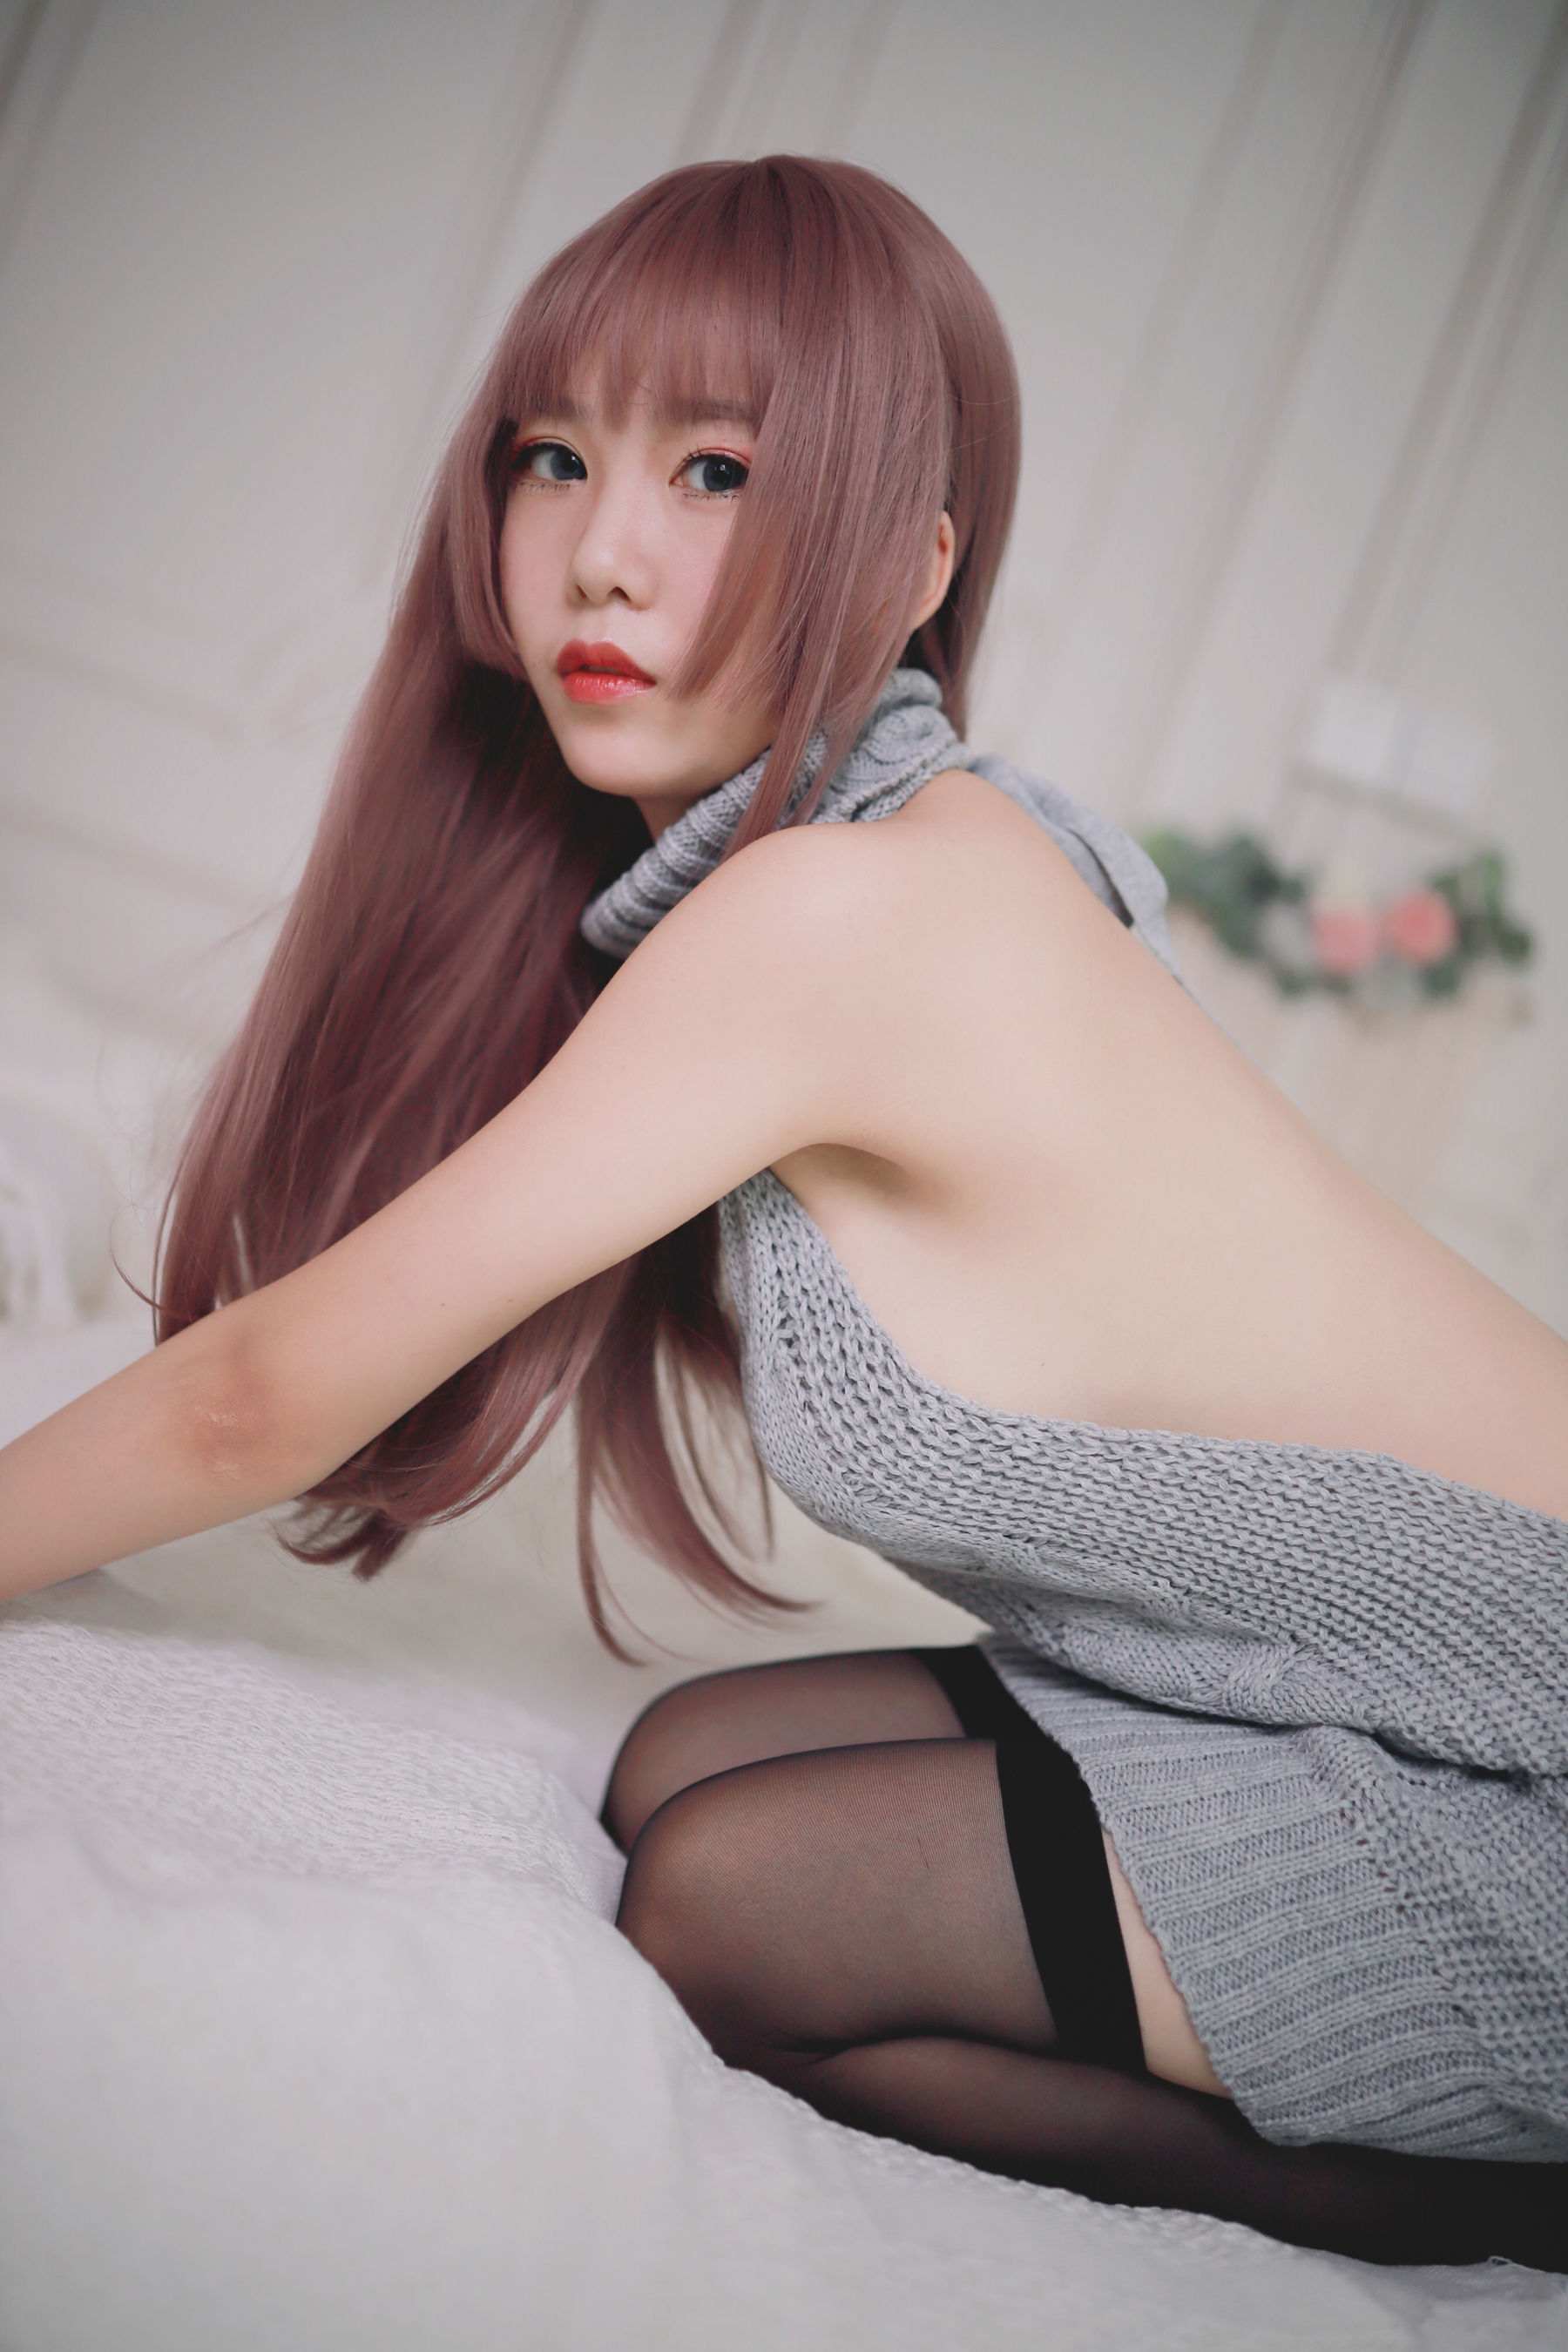 VOL.1283 [网络美女]情趣毛衣:抖娘-利世(Coser抖娘-利世)超高清写真套图(30P)